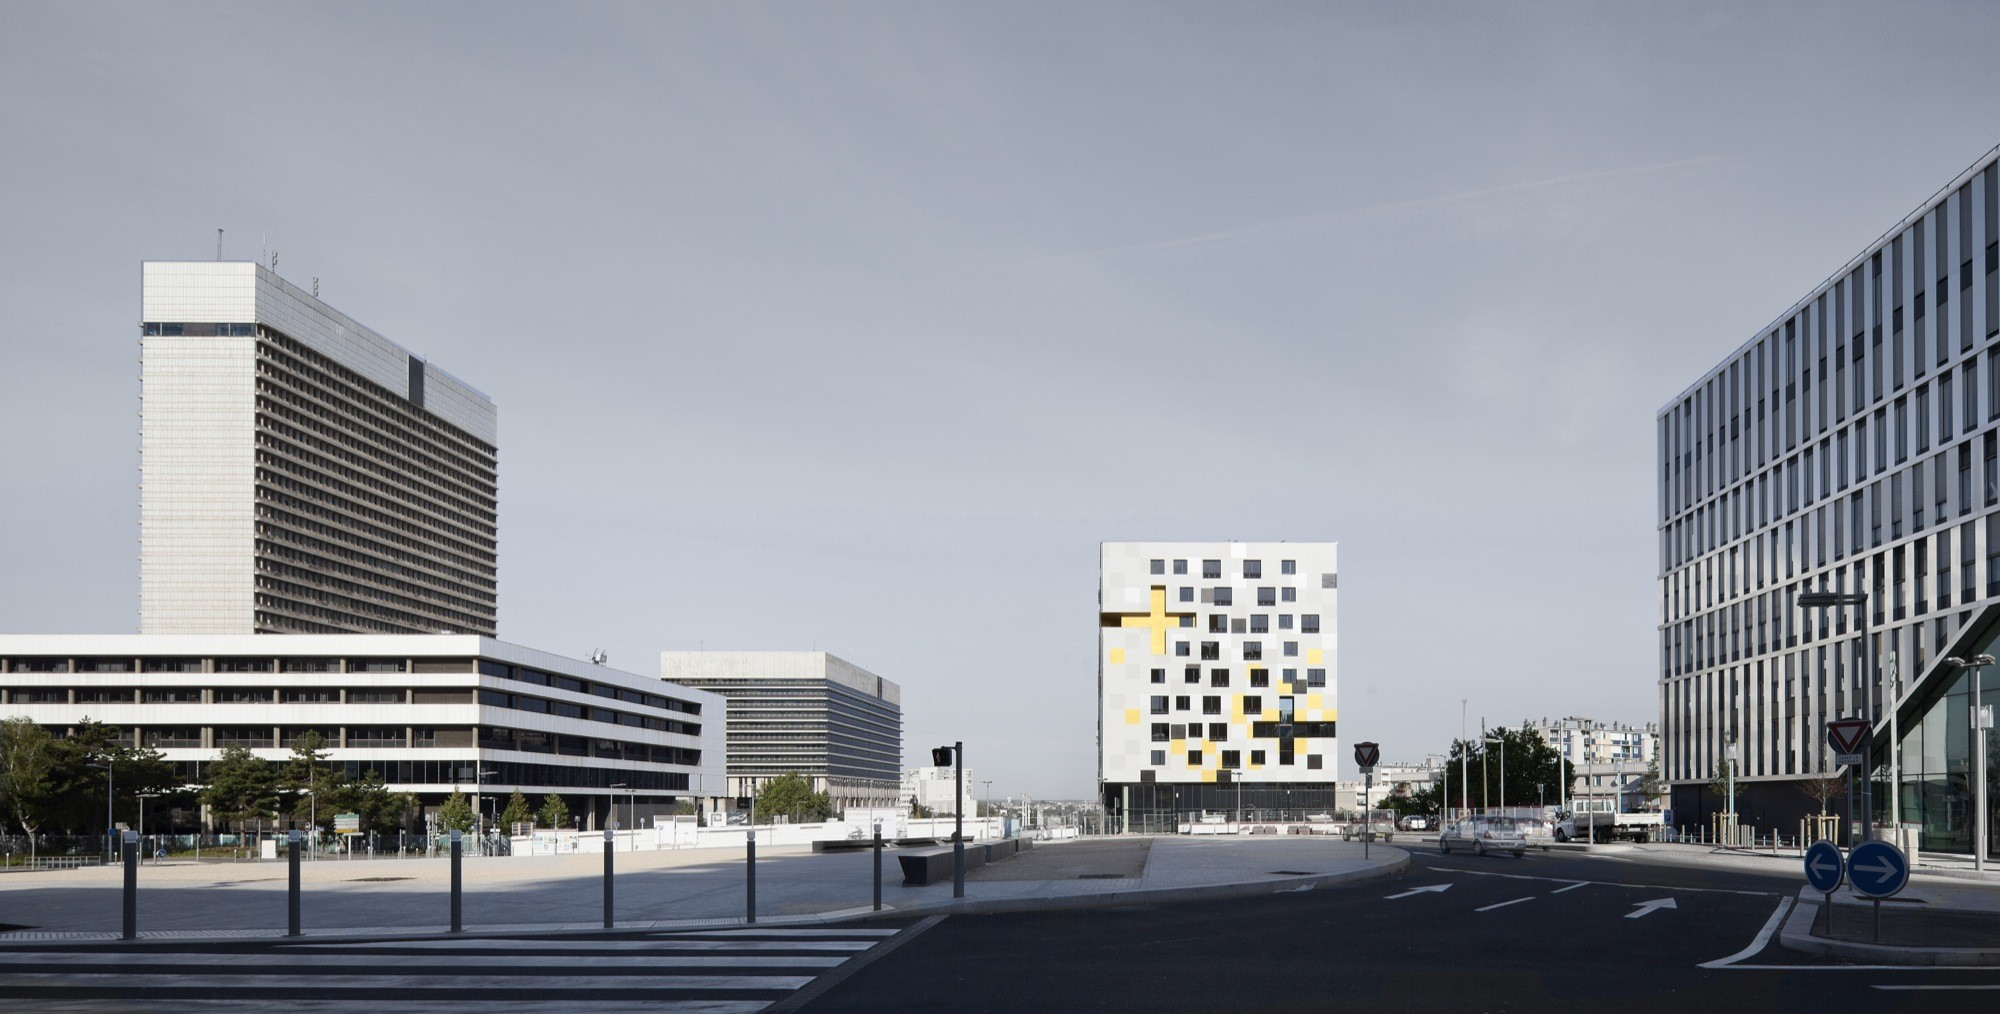 gallery of apartment blocks in nanterre x tu 2. Black Bedroom Furniture Sets. Home Design Ideas